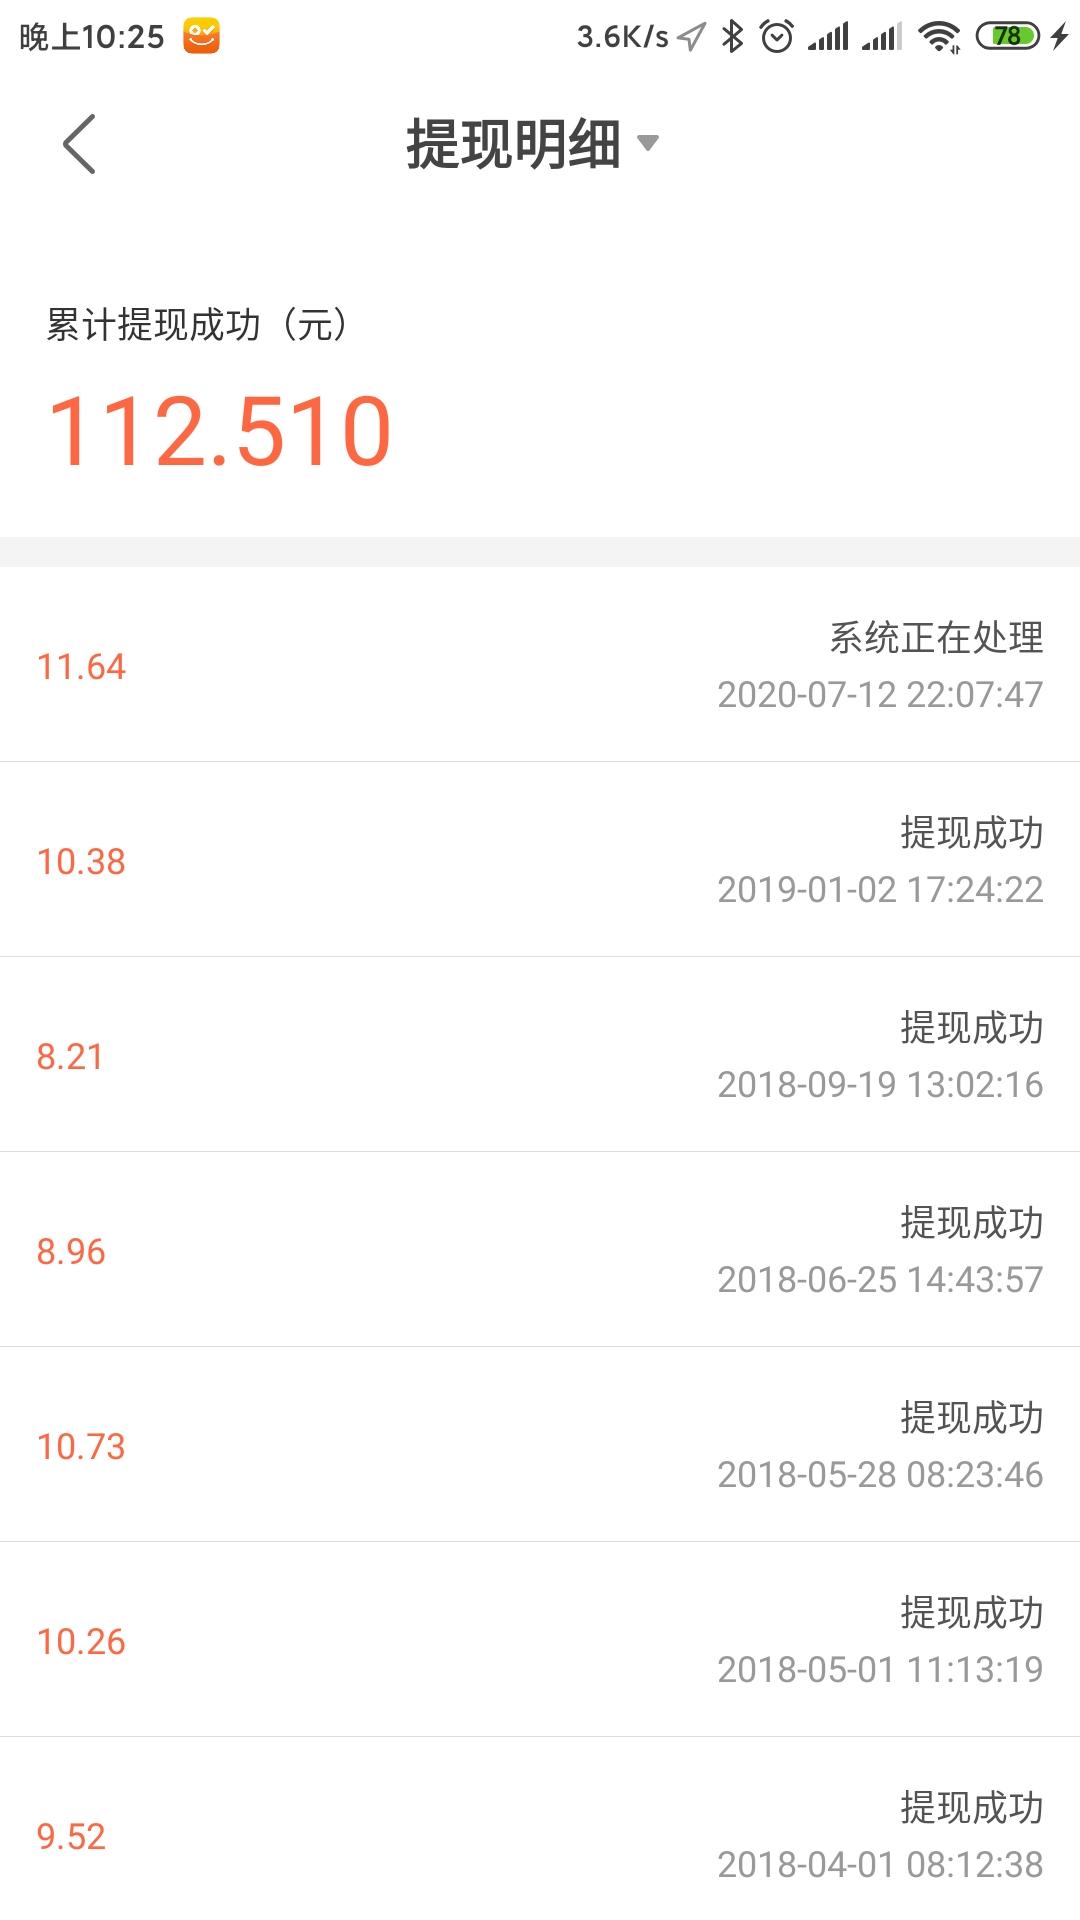 Screenshot_2020-07-12-22-25-27-648_com.lexiangqua.jpg